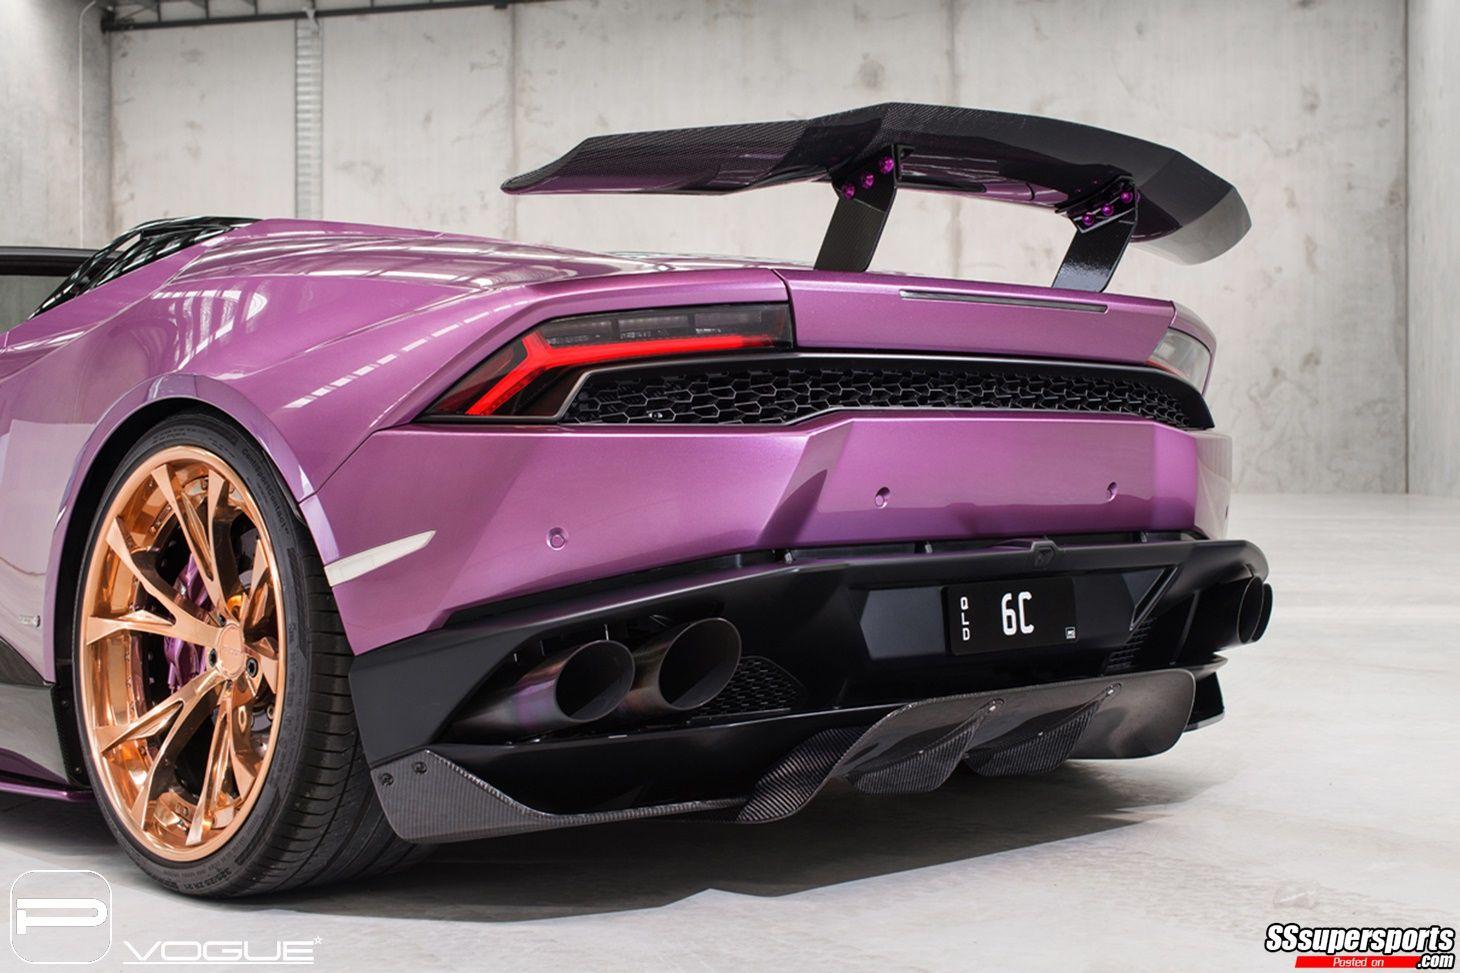 5 Purple Lamborghini Huracan Spyder Gold Rose Pur Wheels Rear End